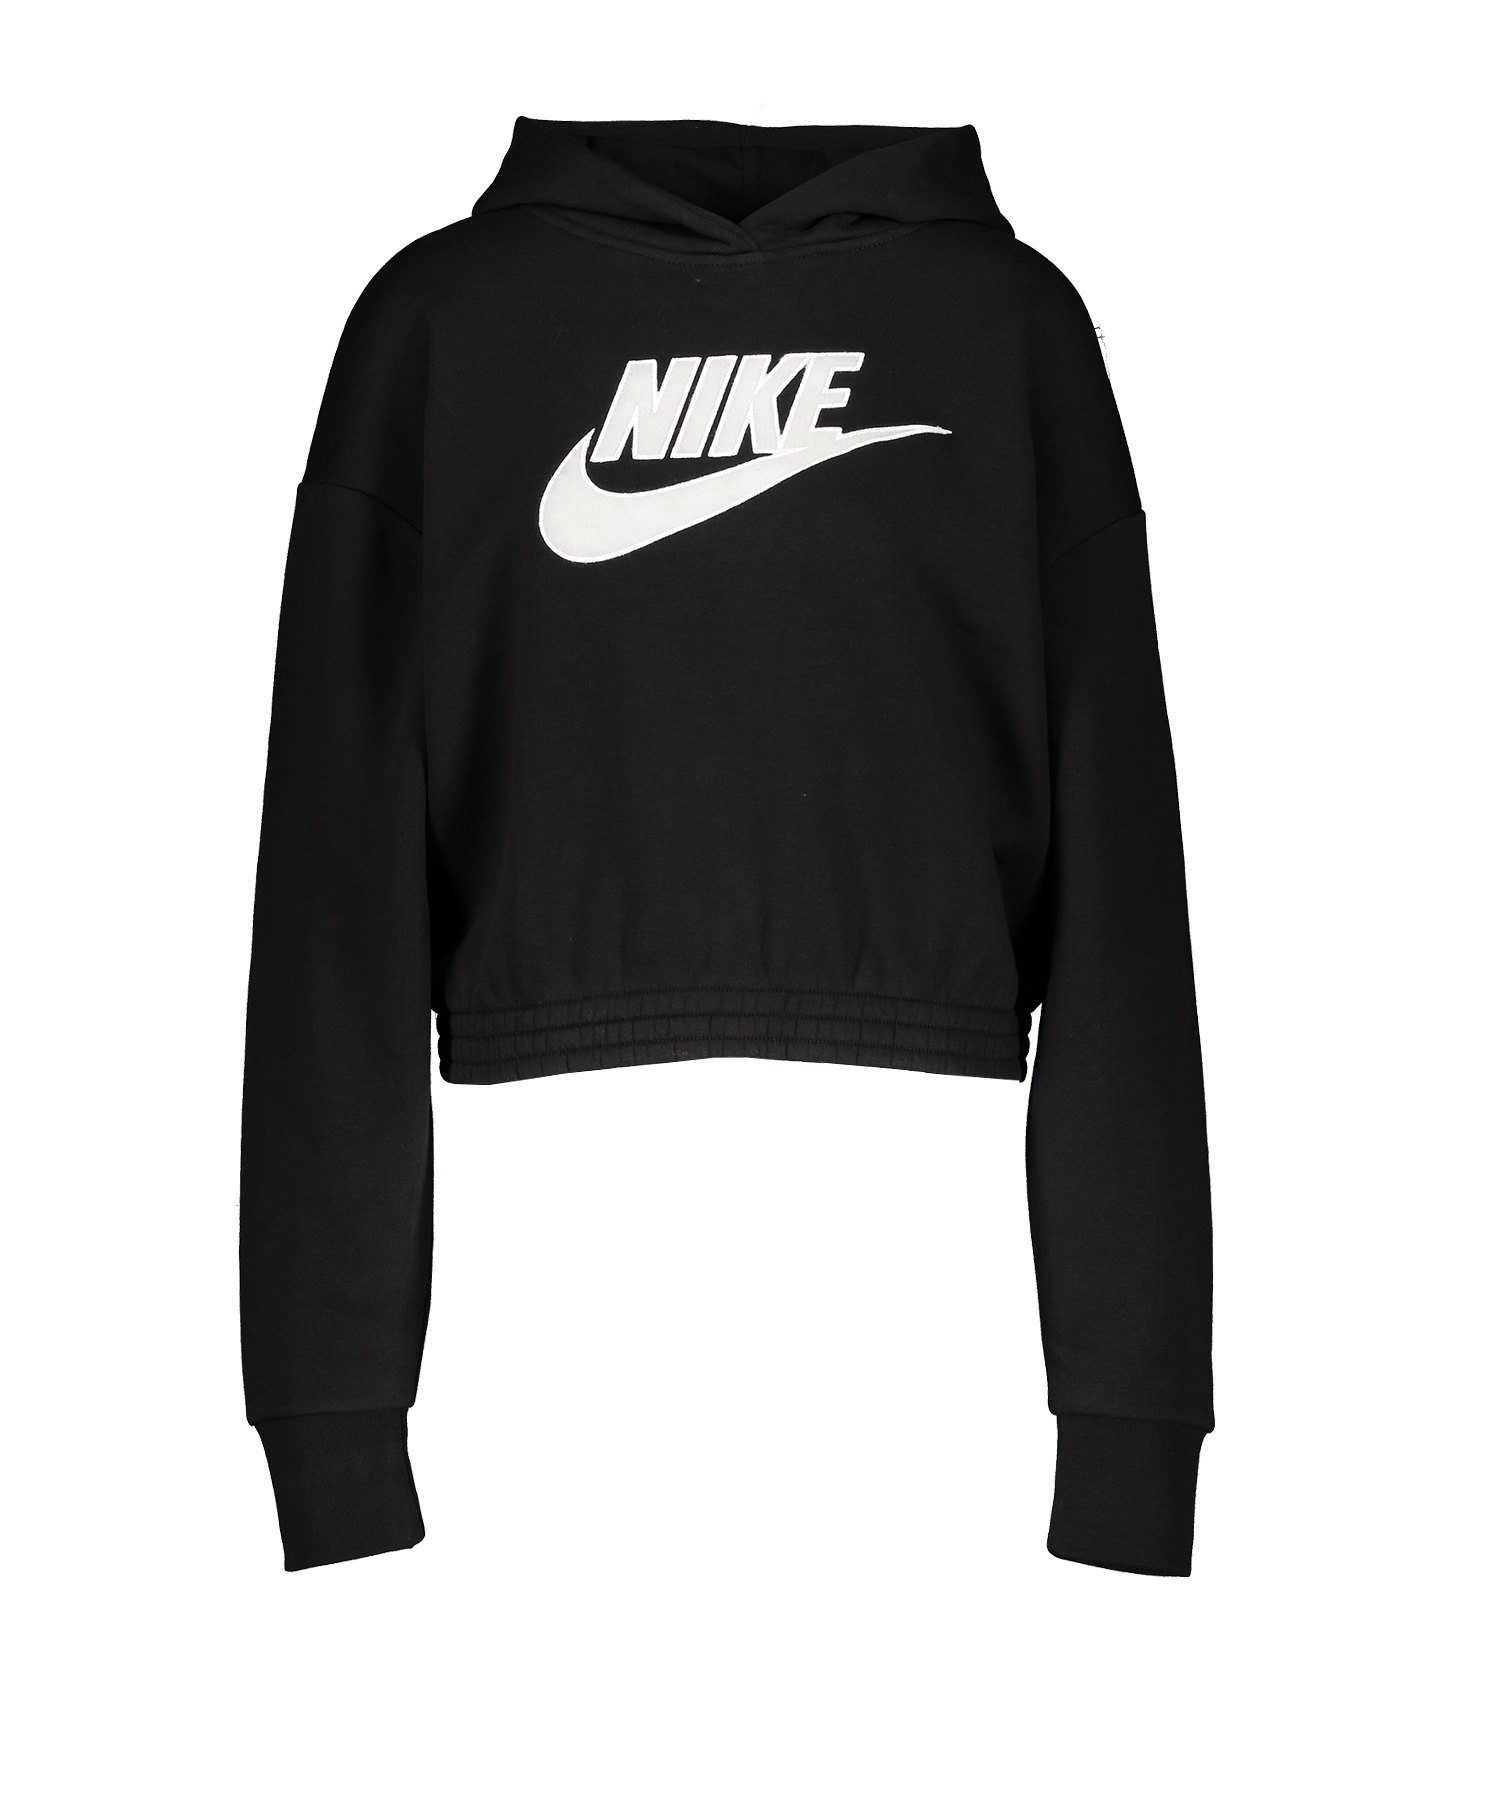 Nike Fleece Hoody Kapuzenpullover Schwarz F010 - schwarz